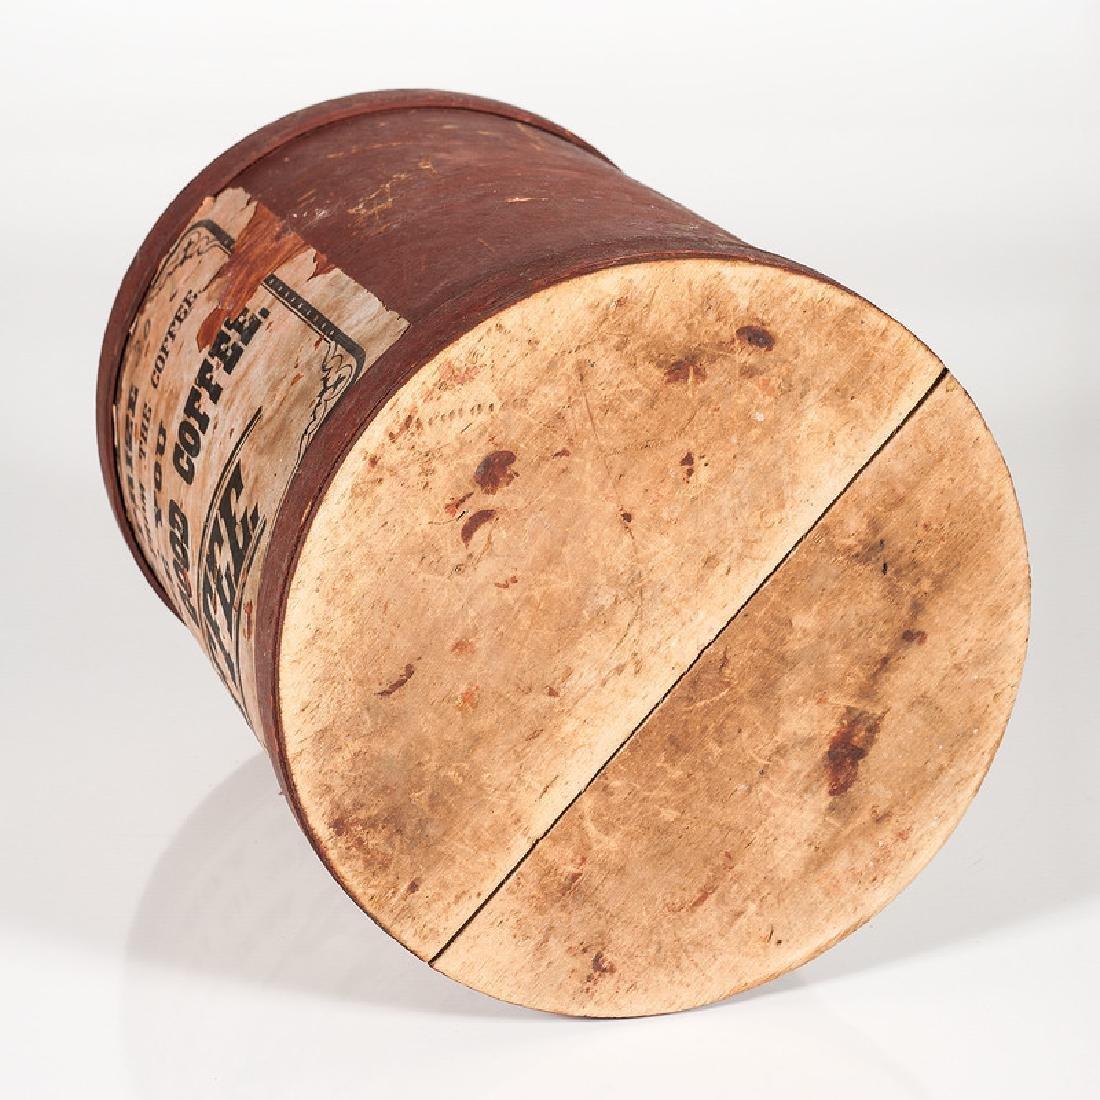 Wood Coffee Bins - 7